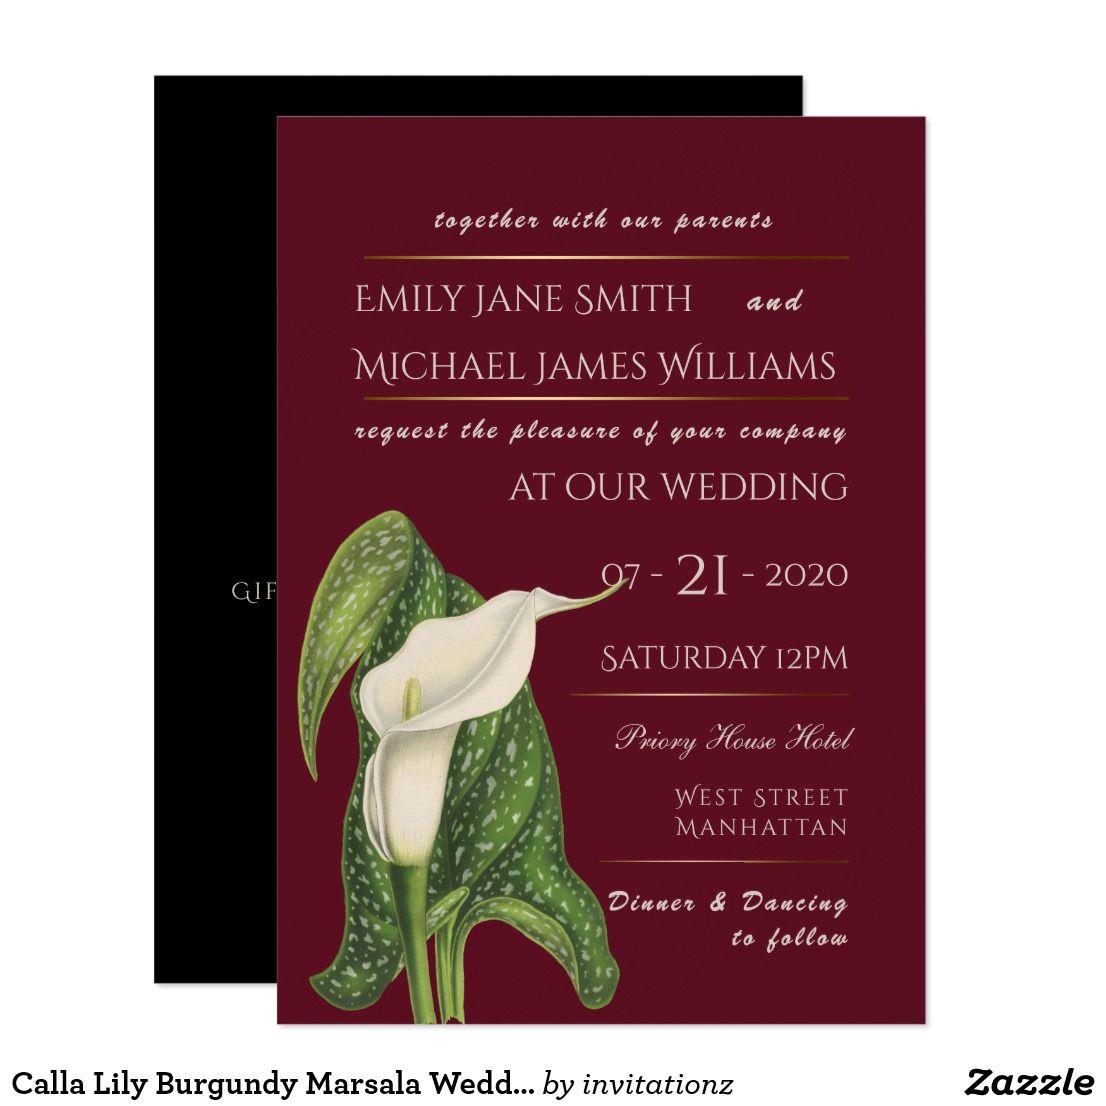 Calla Lily Burgundy Marsala Wedding Invitation | Trending Wedding ...